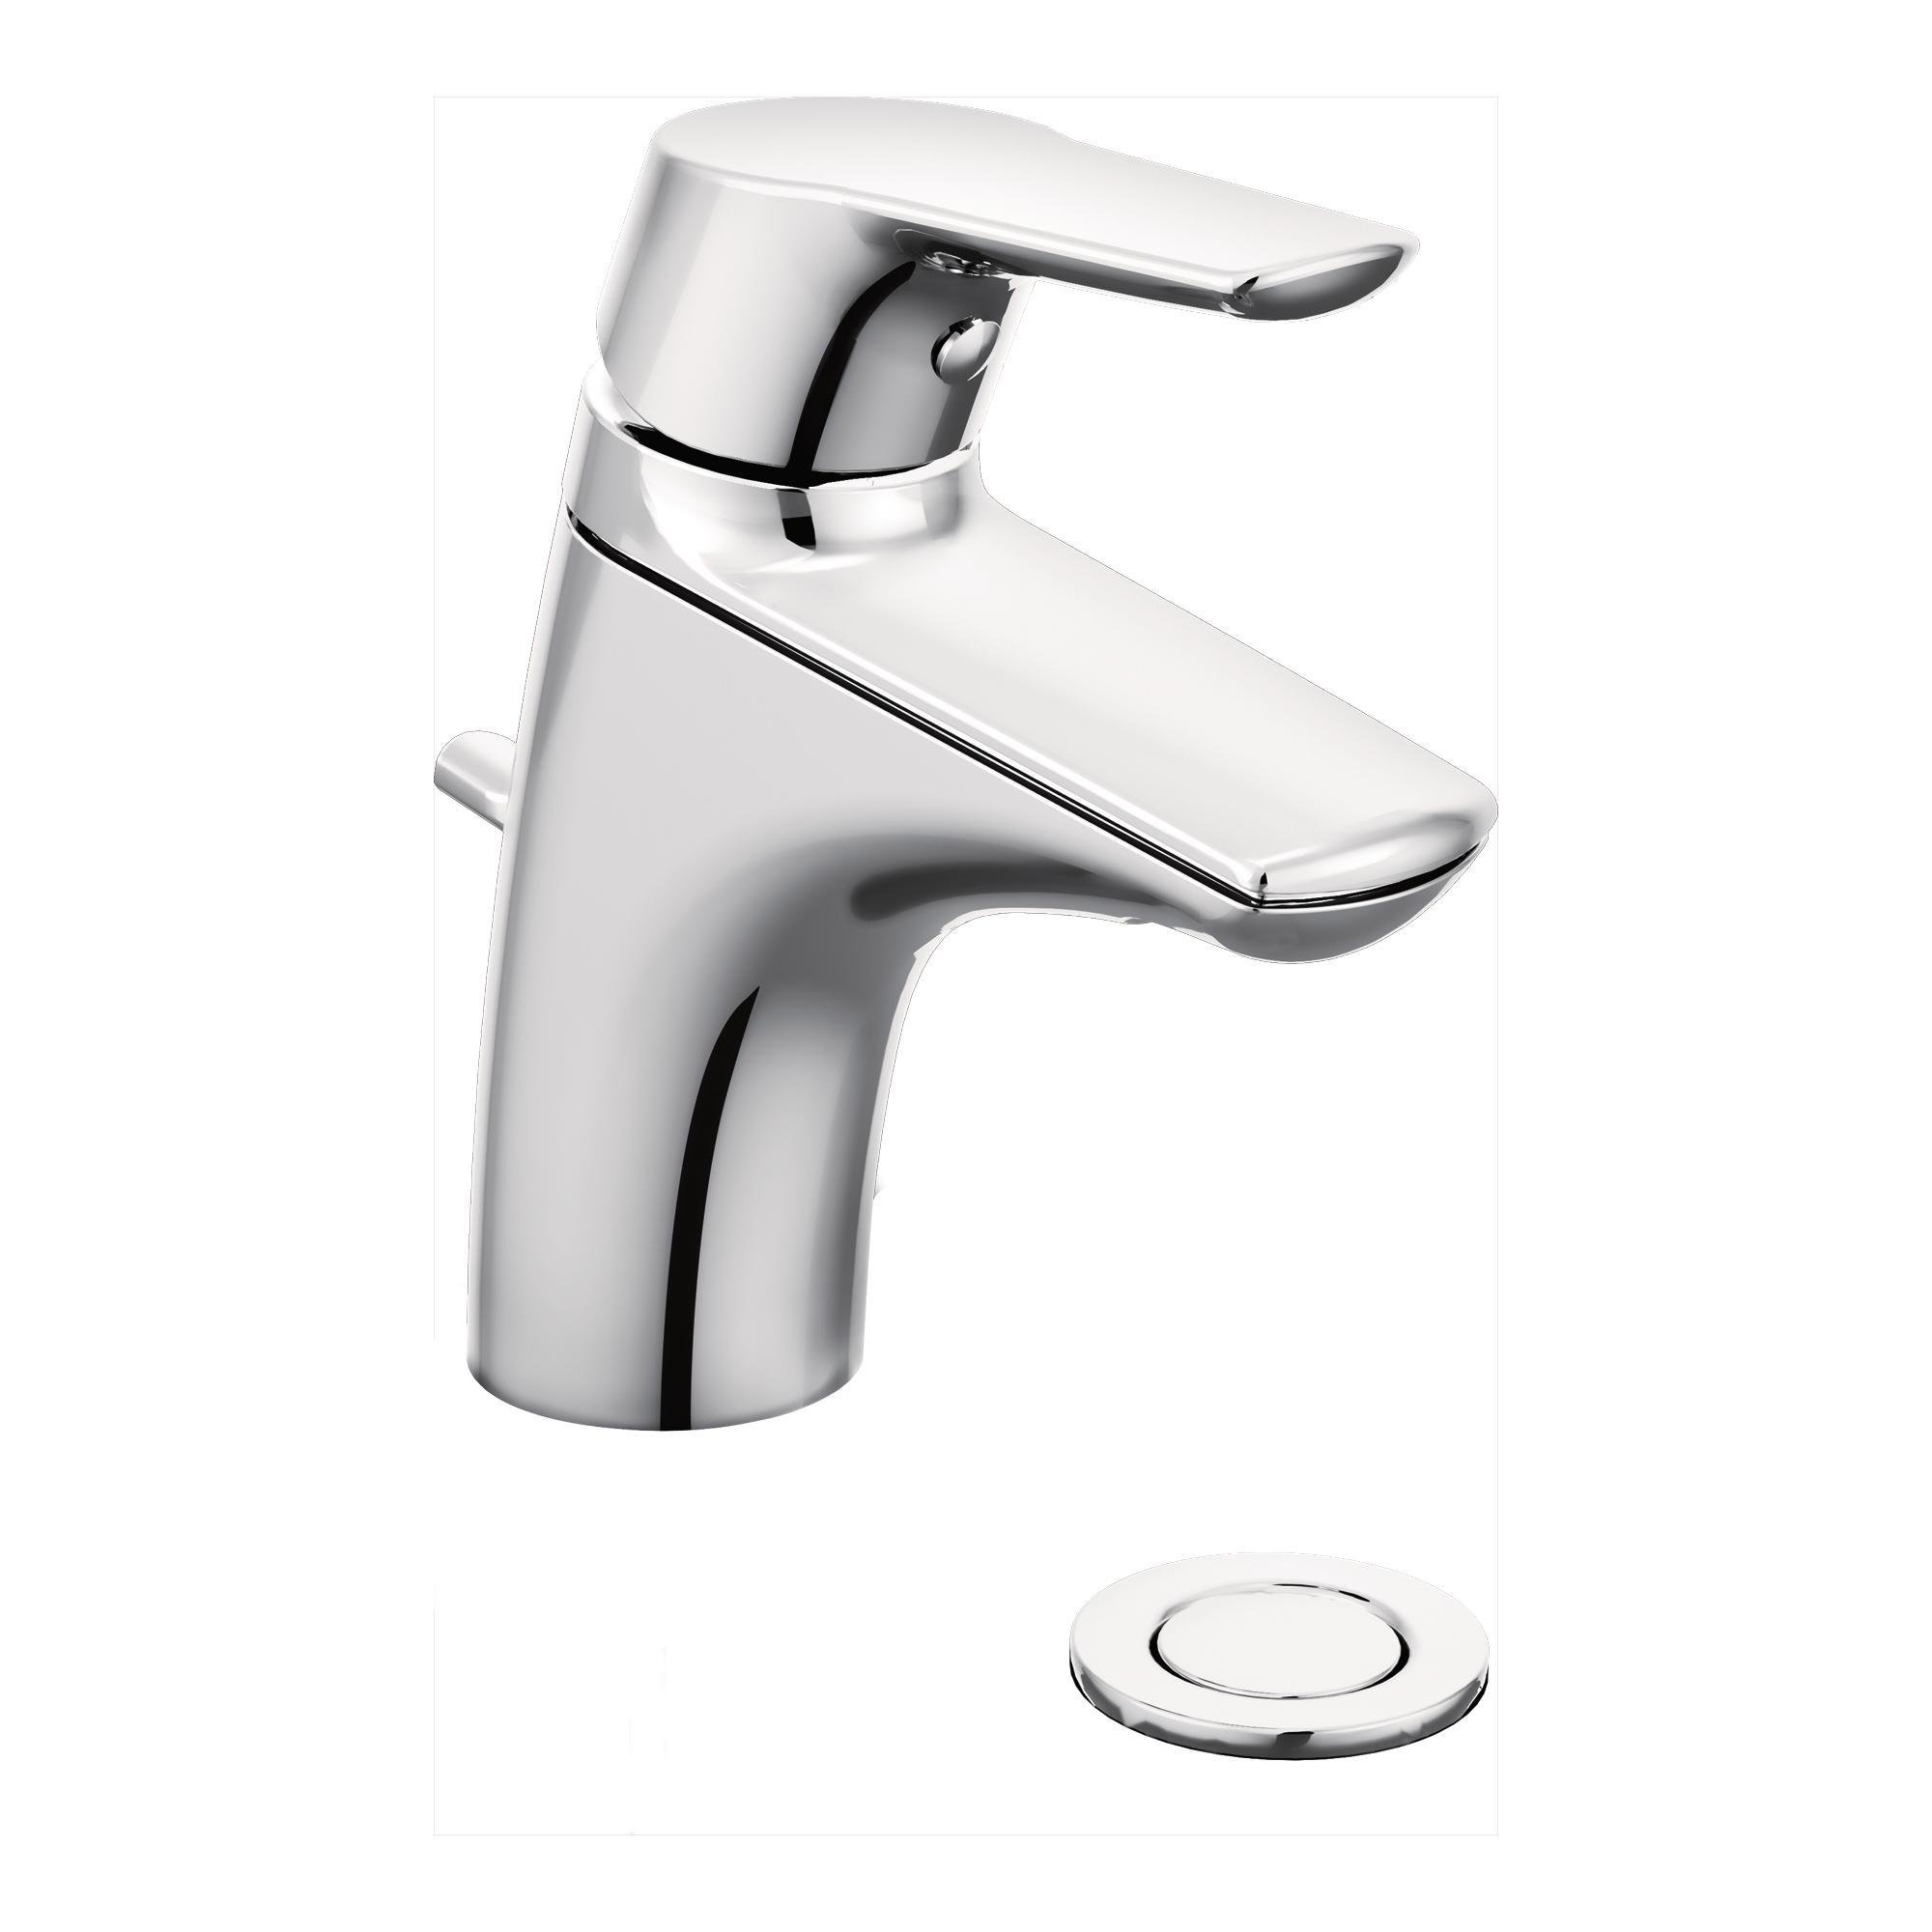 Moen 6810 Method One Handle Single Hole Bathroom Faucet 1